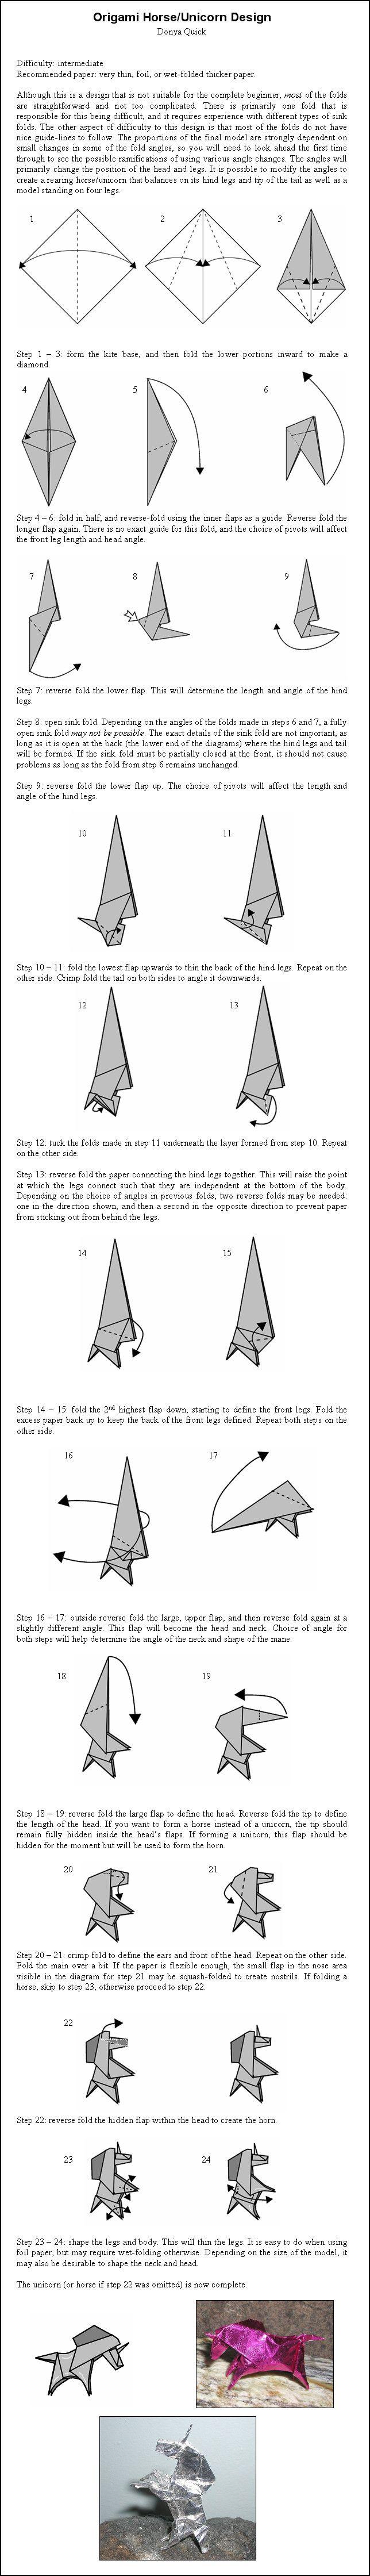 origami unicorn blade runner instructions